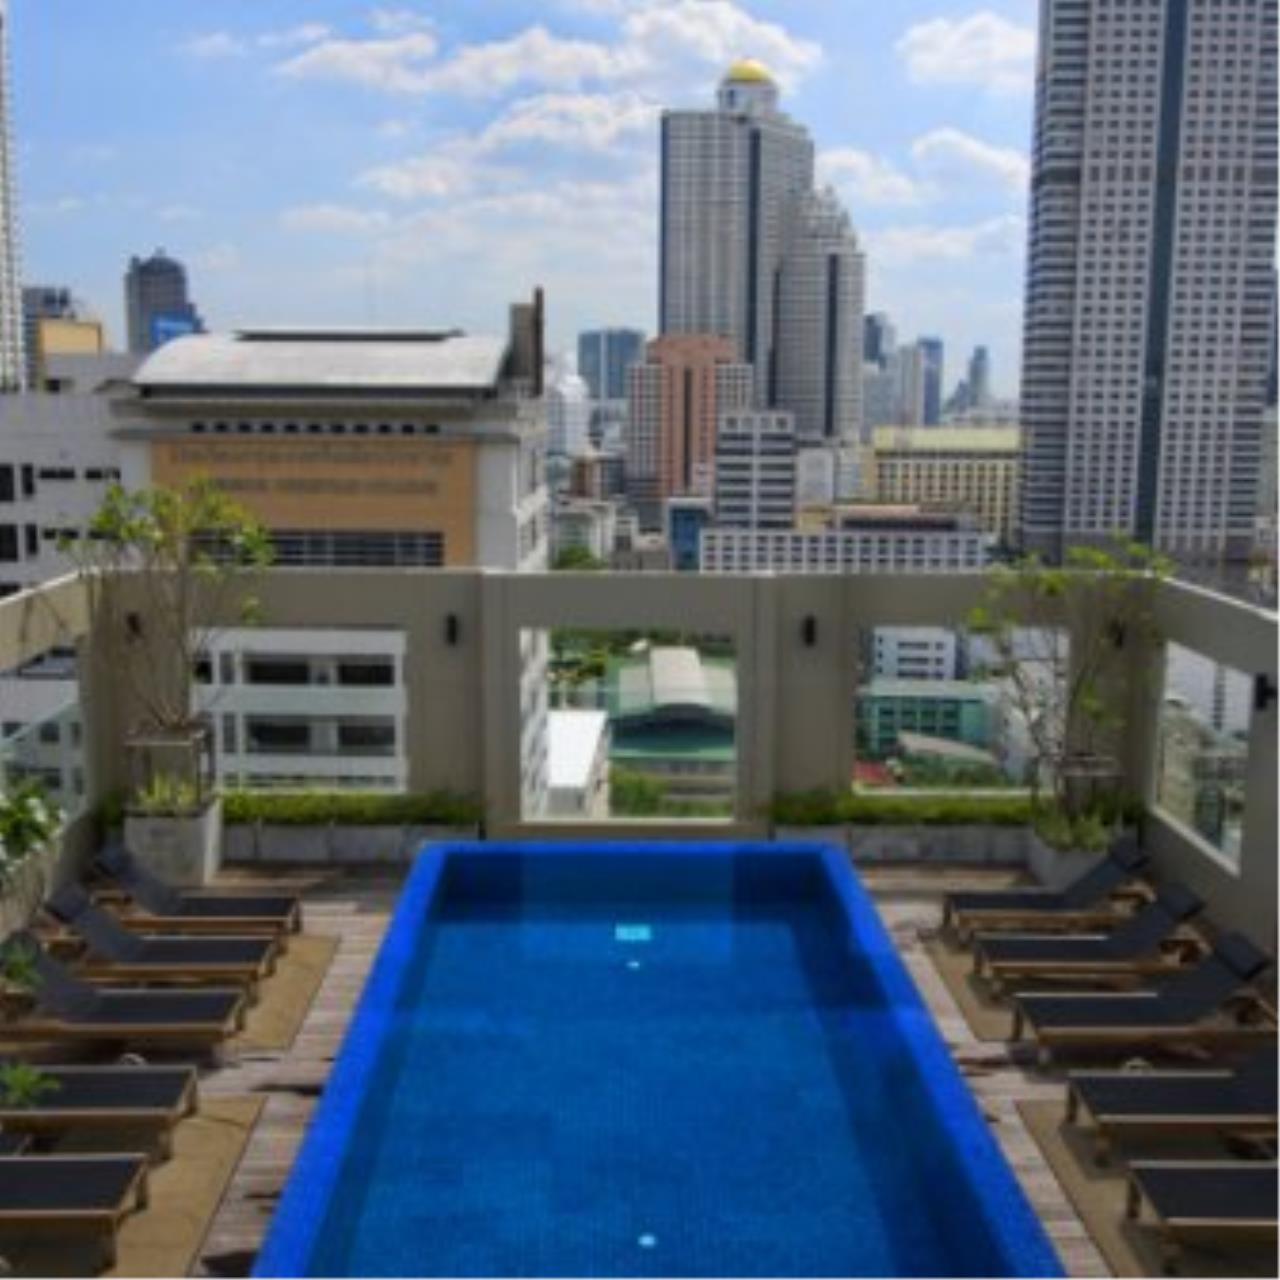 BKK Condos Agency's Fabulous 4 bedroom apartments for rental, 1 unit per floor, at Panburi, Silom 8